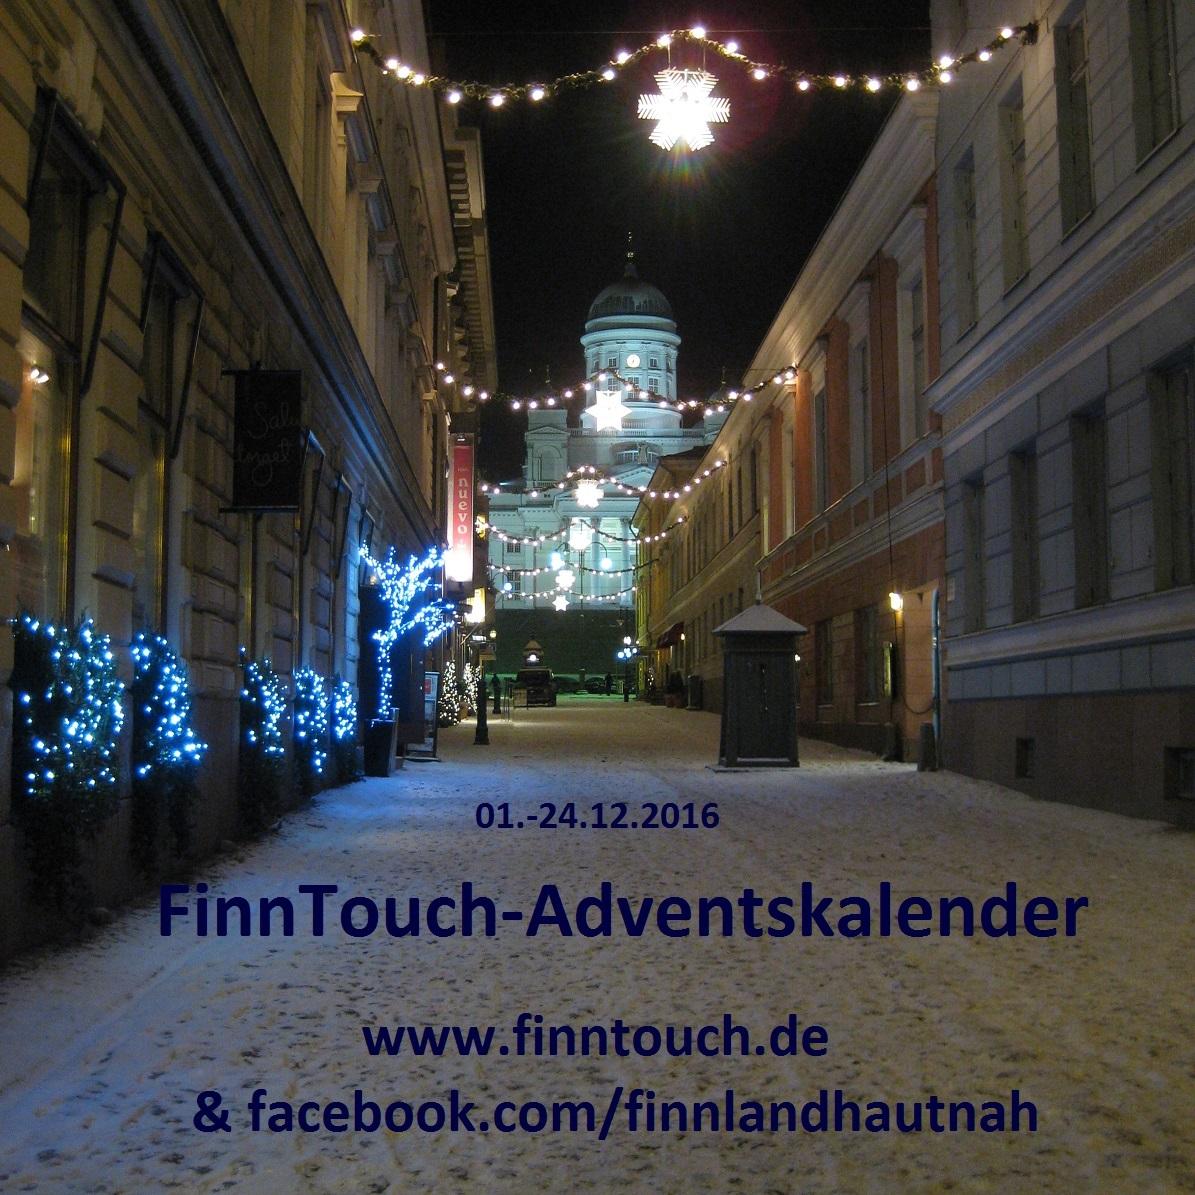 finntouch_adventskalender_2016_teaser